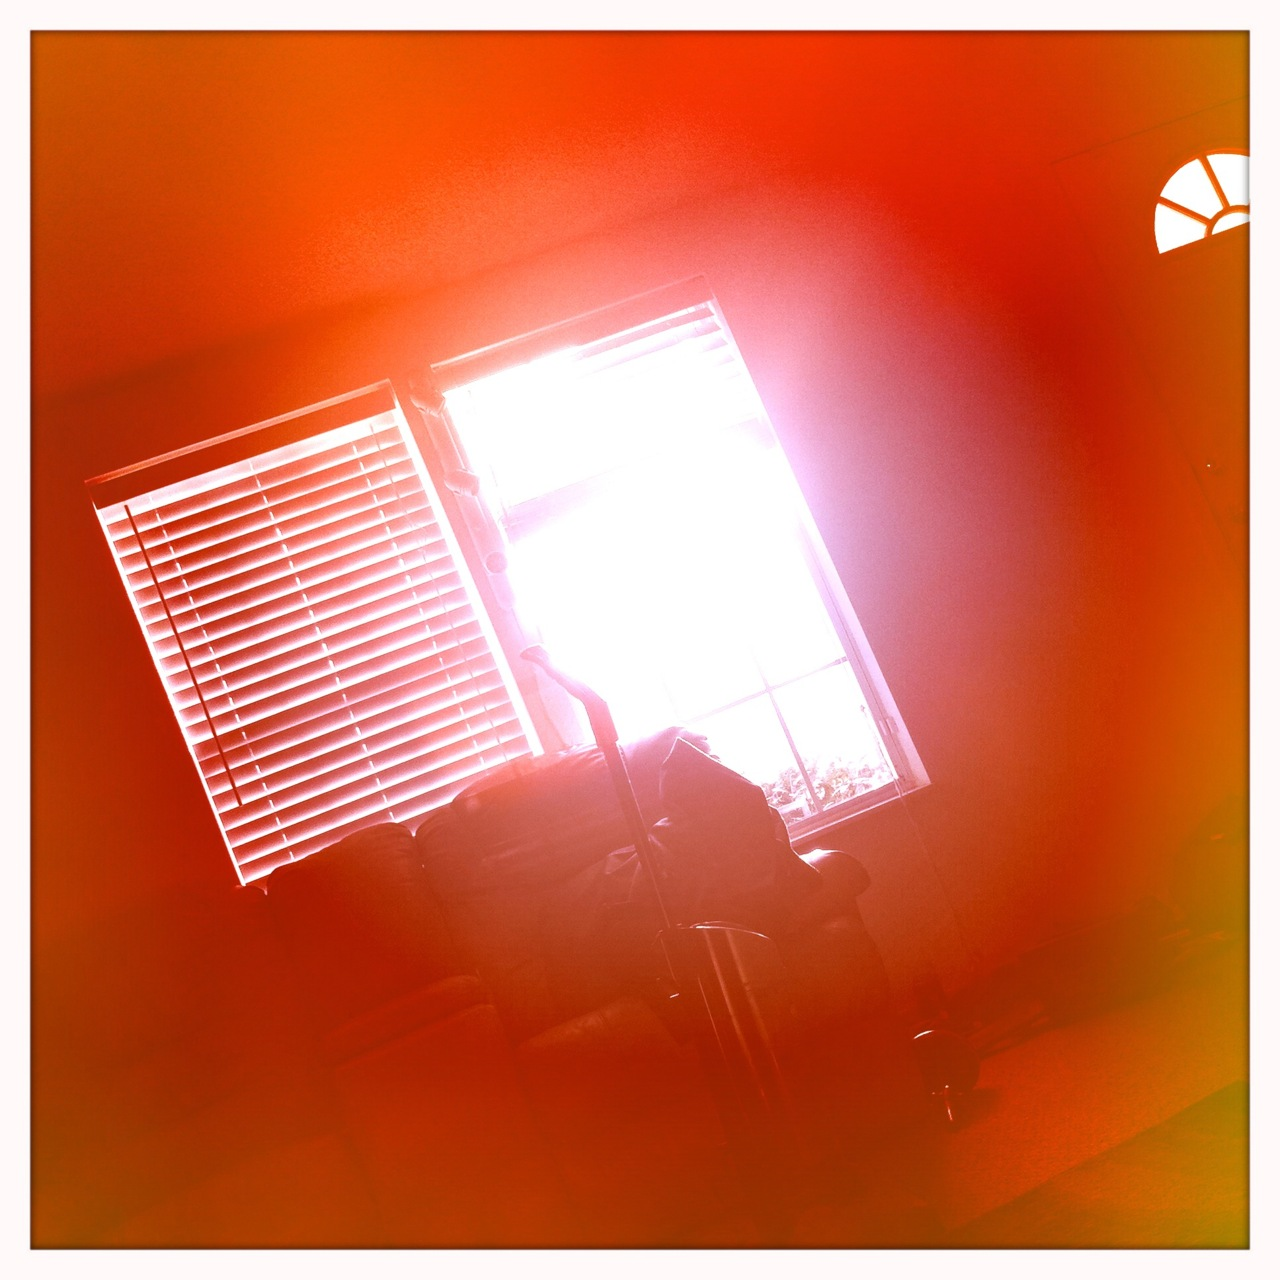 Sunrise through the window 2 Kaimal Mark II Lens, Blanko Film, Cherry Shine Flash,